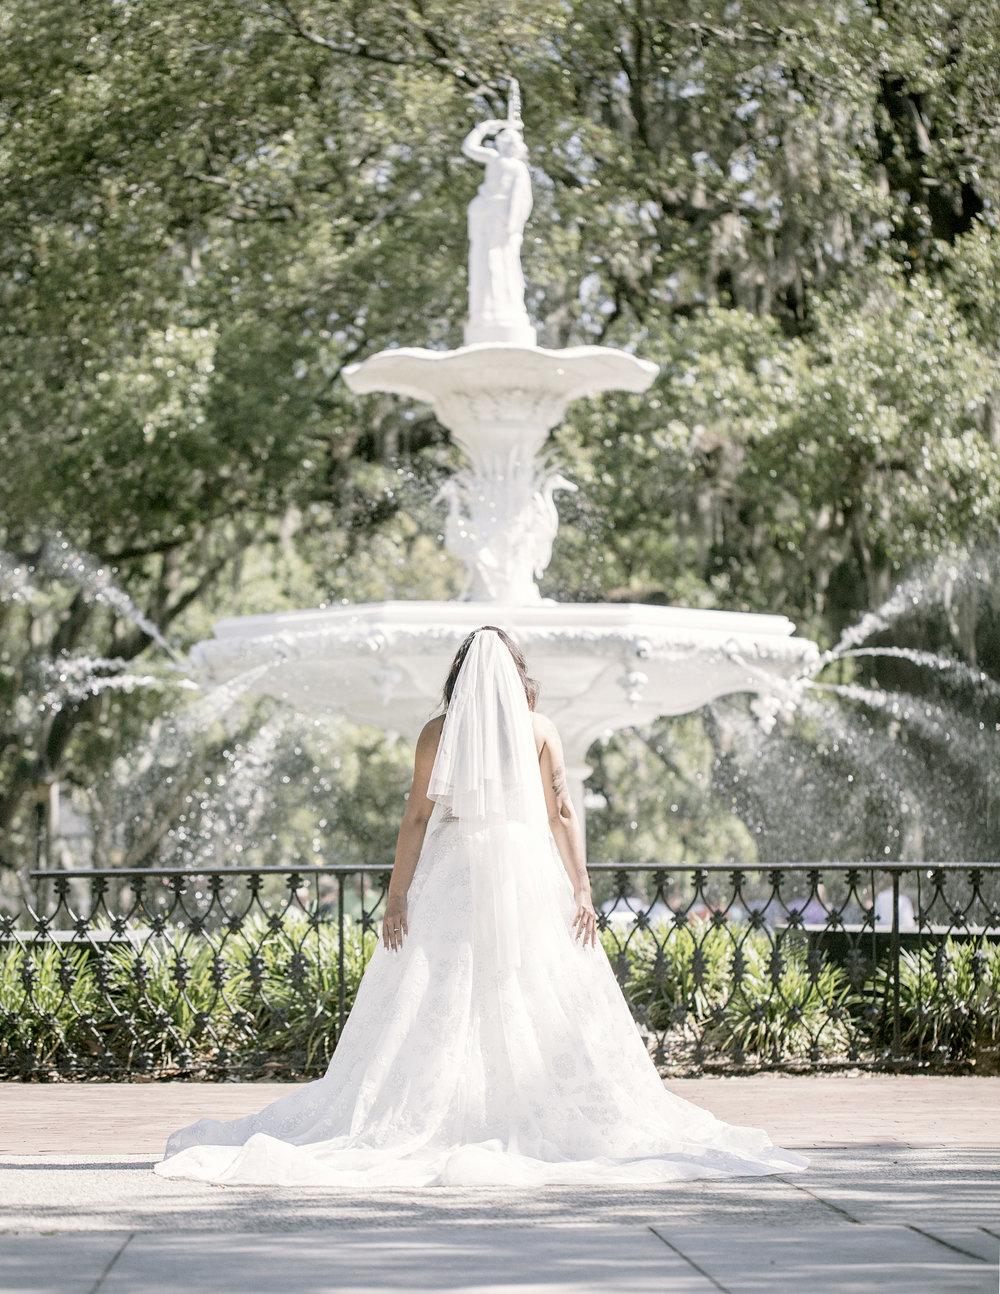 savannah-bridal-shop-unexpected-joys-of-wedding-planning-savannah-wedding-planning-gina-vogel-photography-savannah-weddings-3.jpg